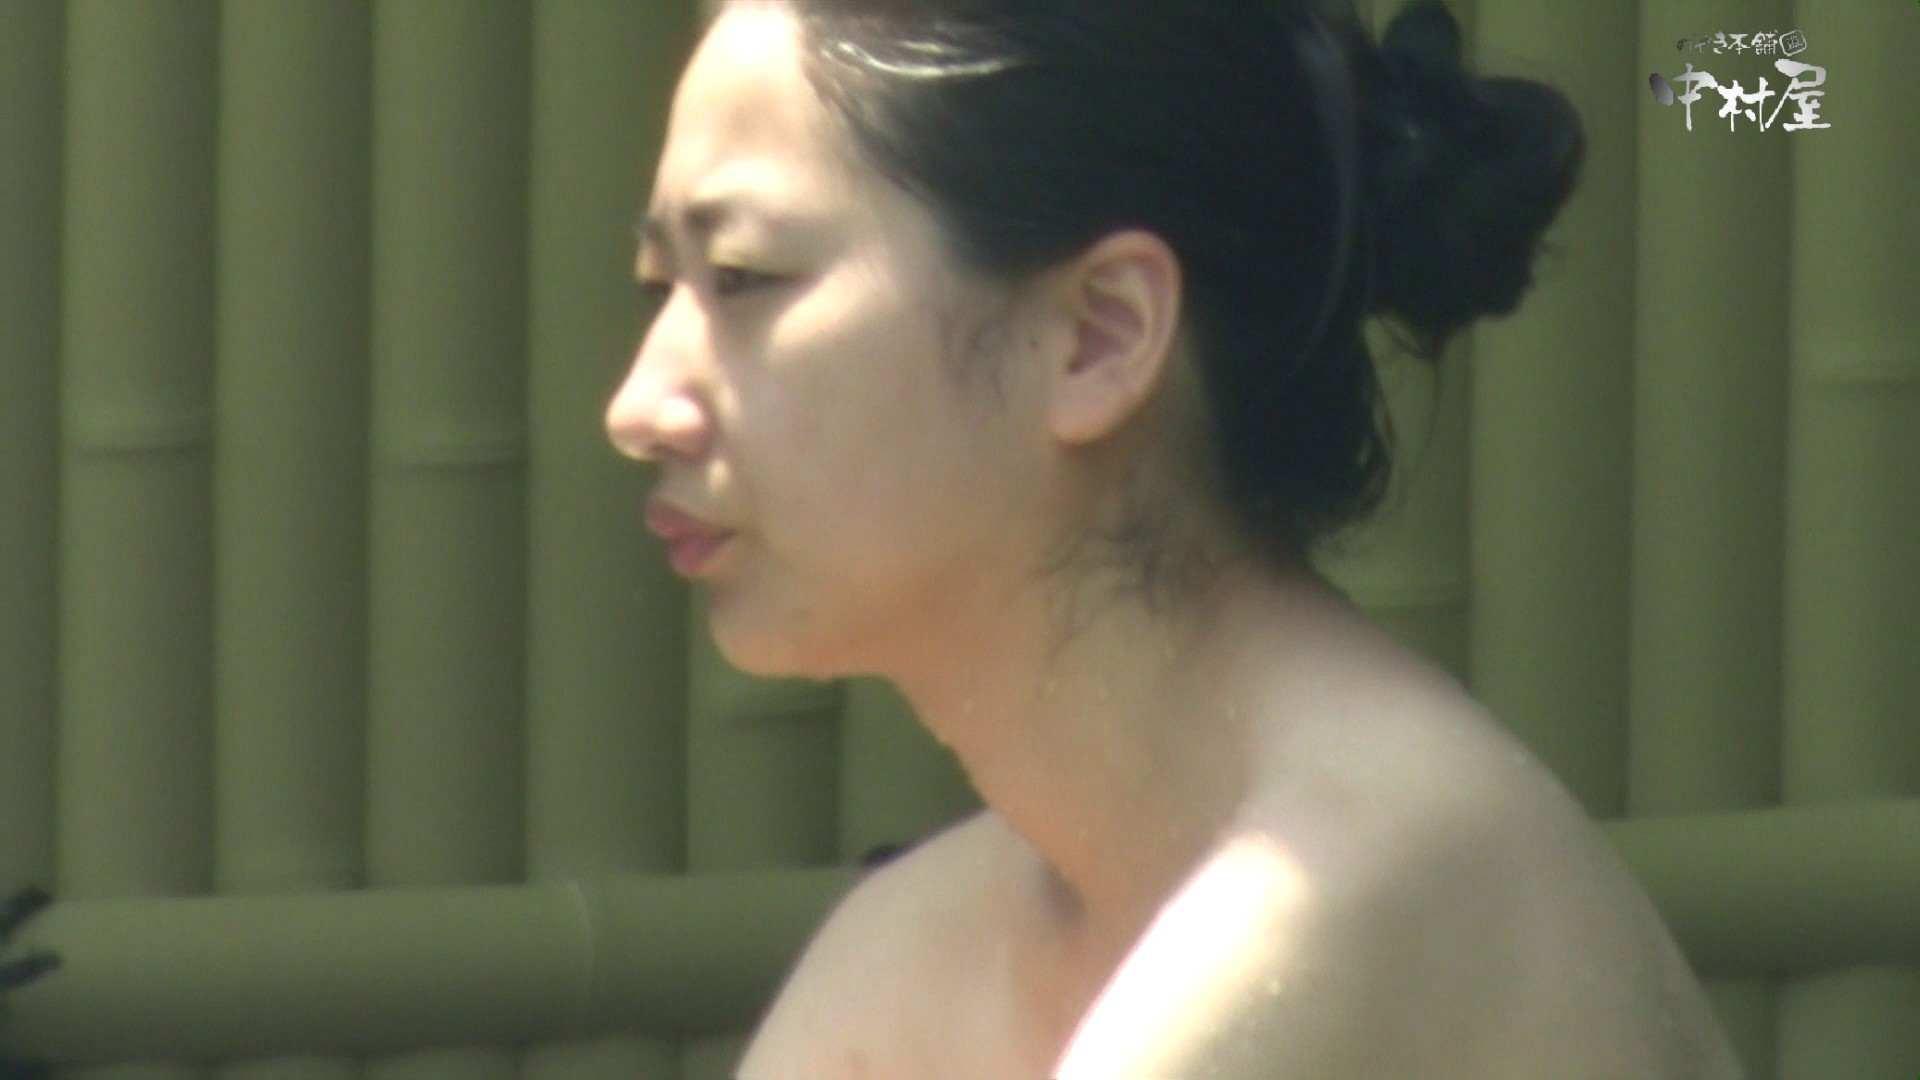 Aquaな露天風呂Vol.888 盗撮 エロ無料画像 77画像 26